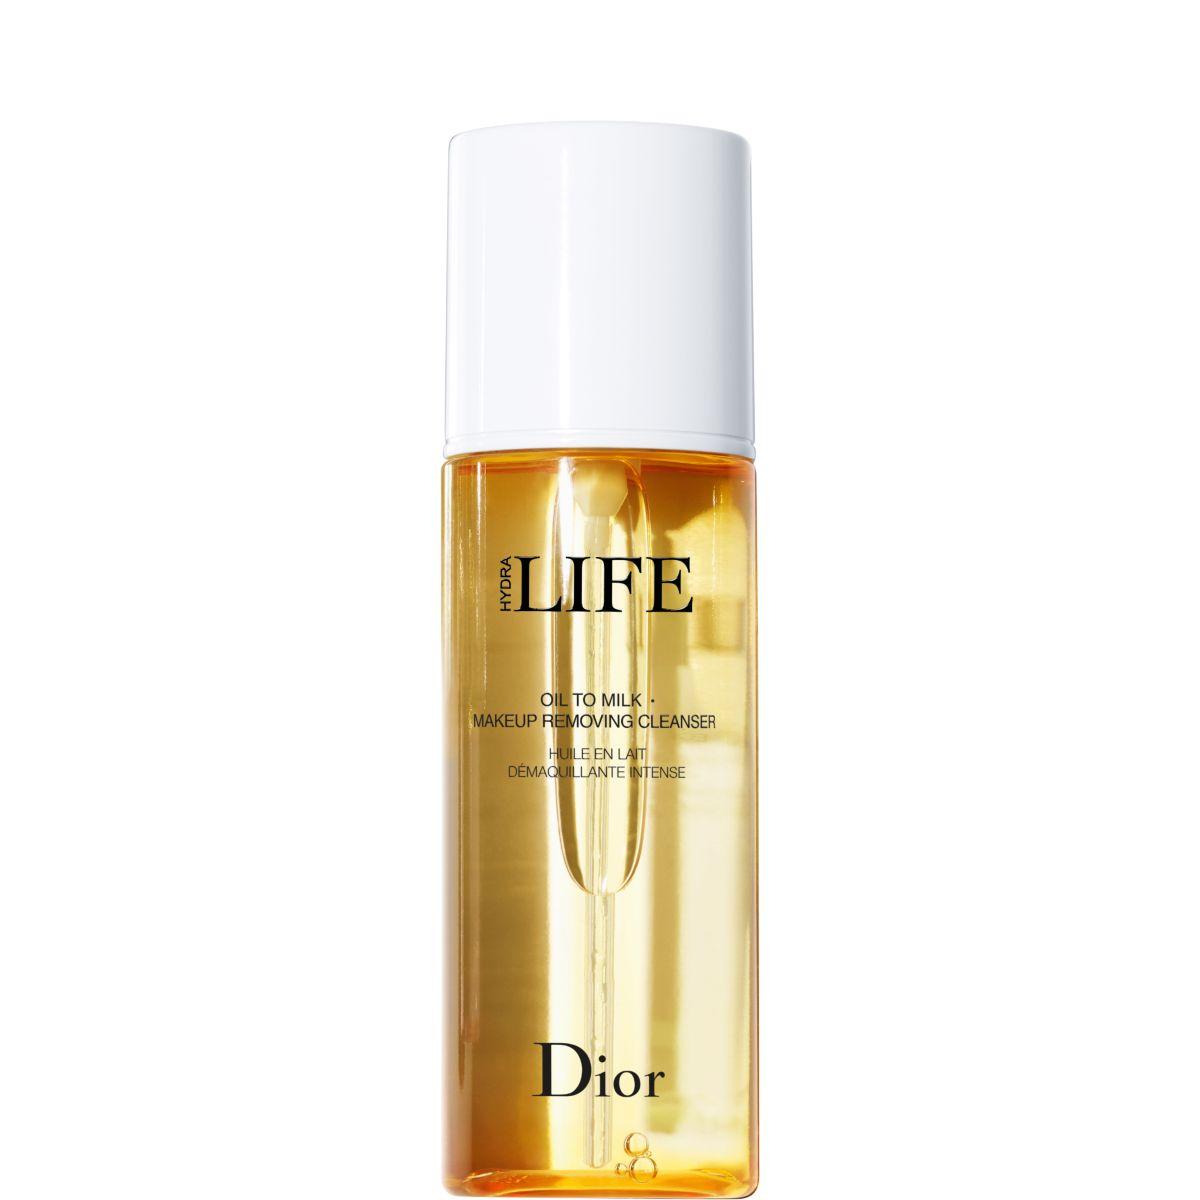 Dior - Dior Hydra Life - Huile en Lait Démaquillante Intense - 200 ml